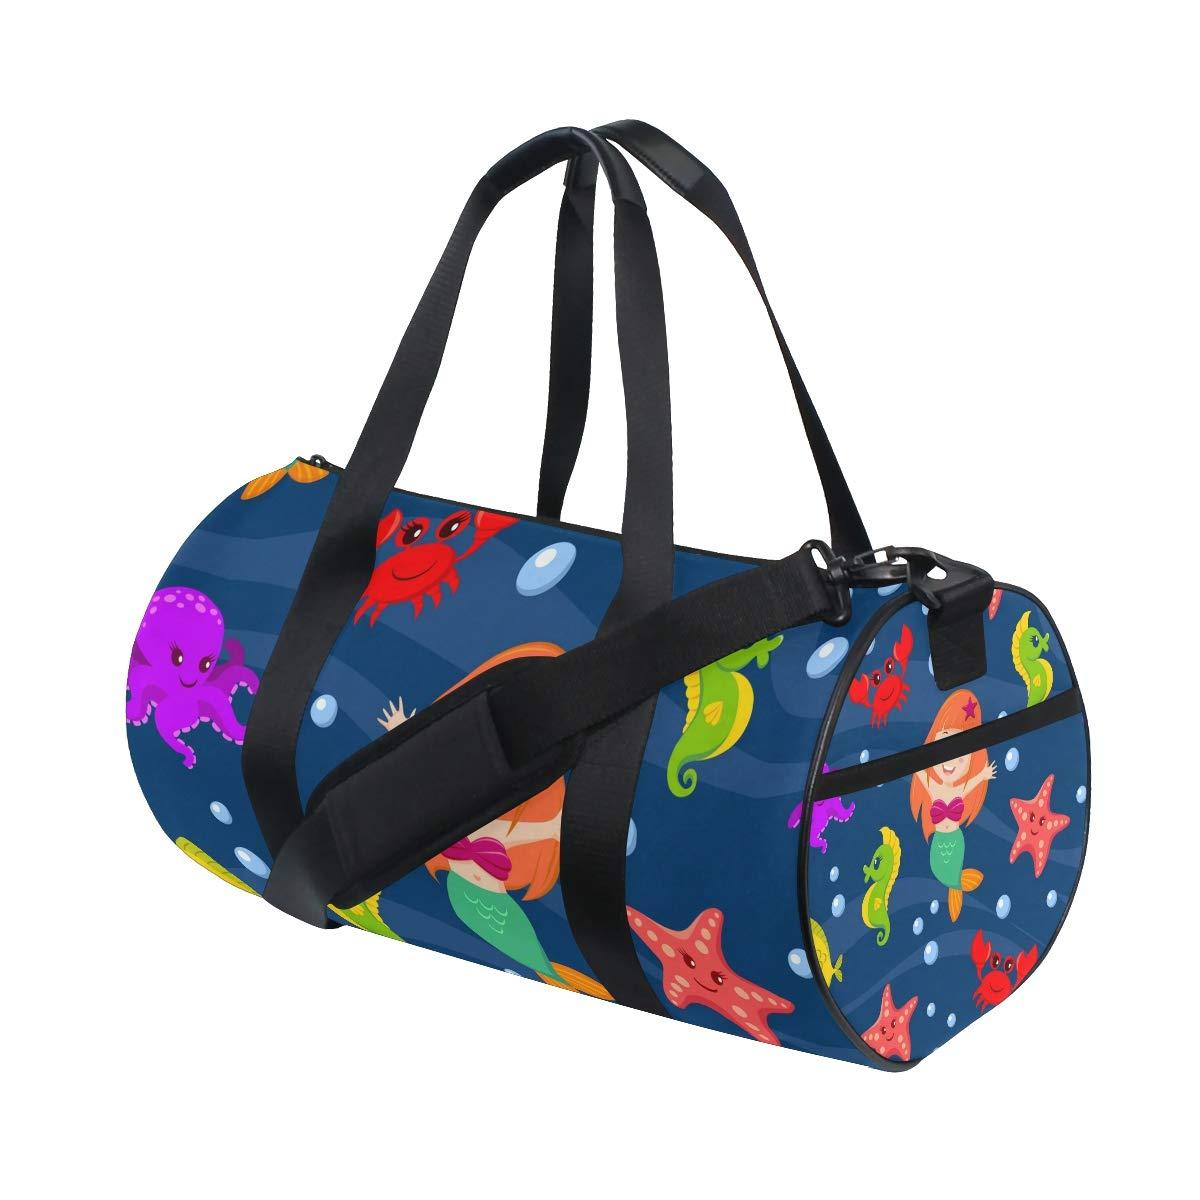 WIHVE Gym Duffel Bag Cartoon Mermaid Sea Crab Starfish Animals Sports Lightweight Canvas Travel Luggage Bag